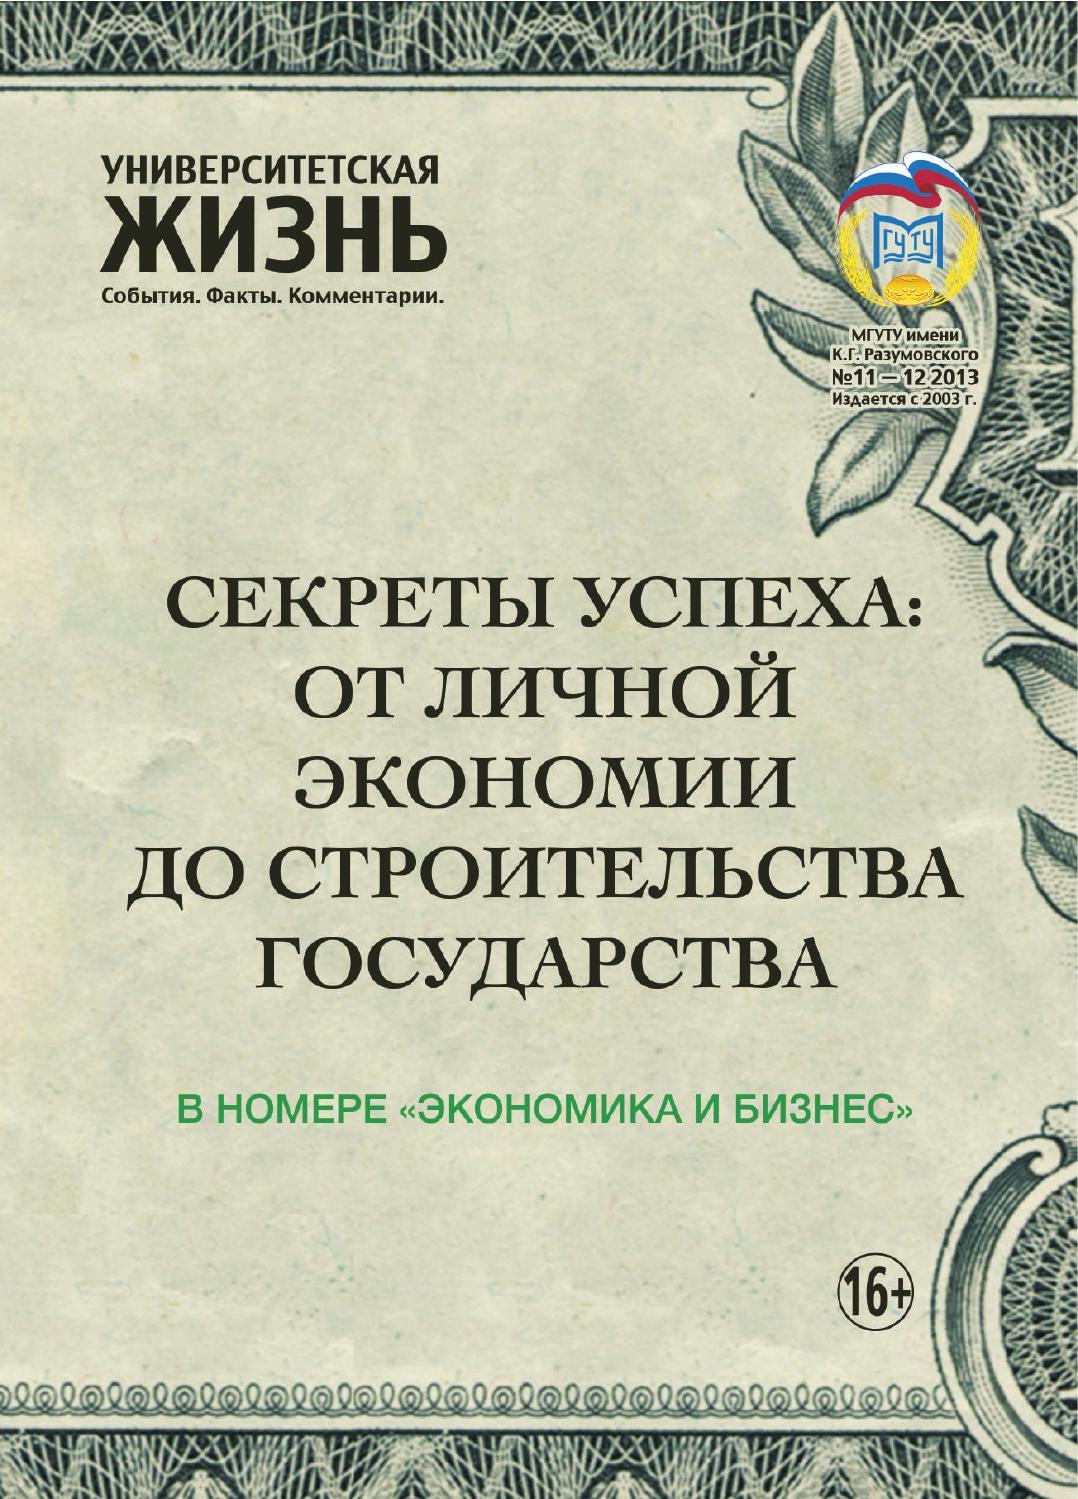 e55fa732a9d1 «Университетская жизнь» №11-12 2013 by Julie Khatsko - issuu